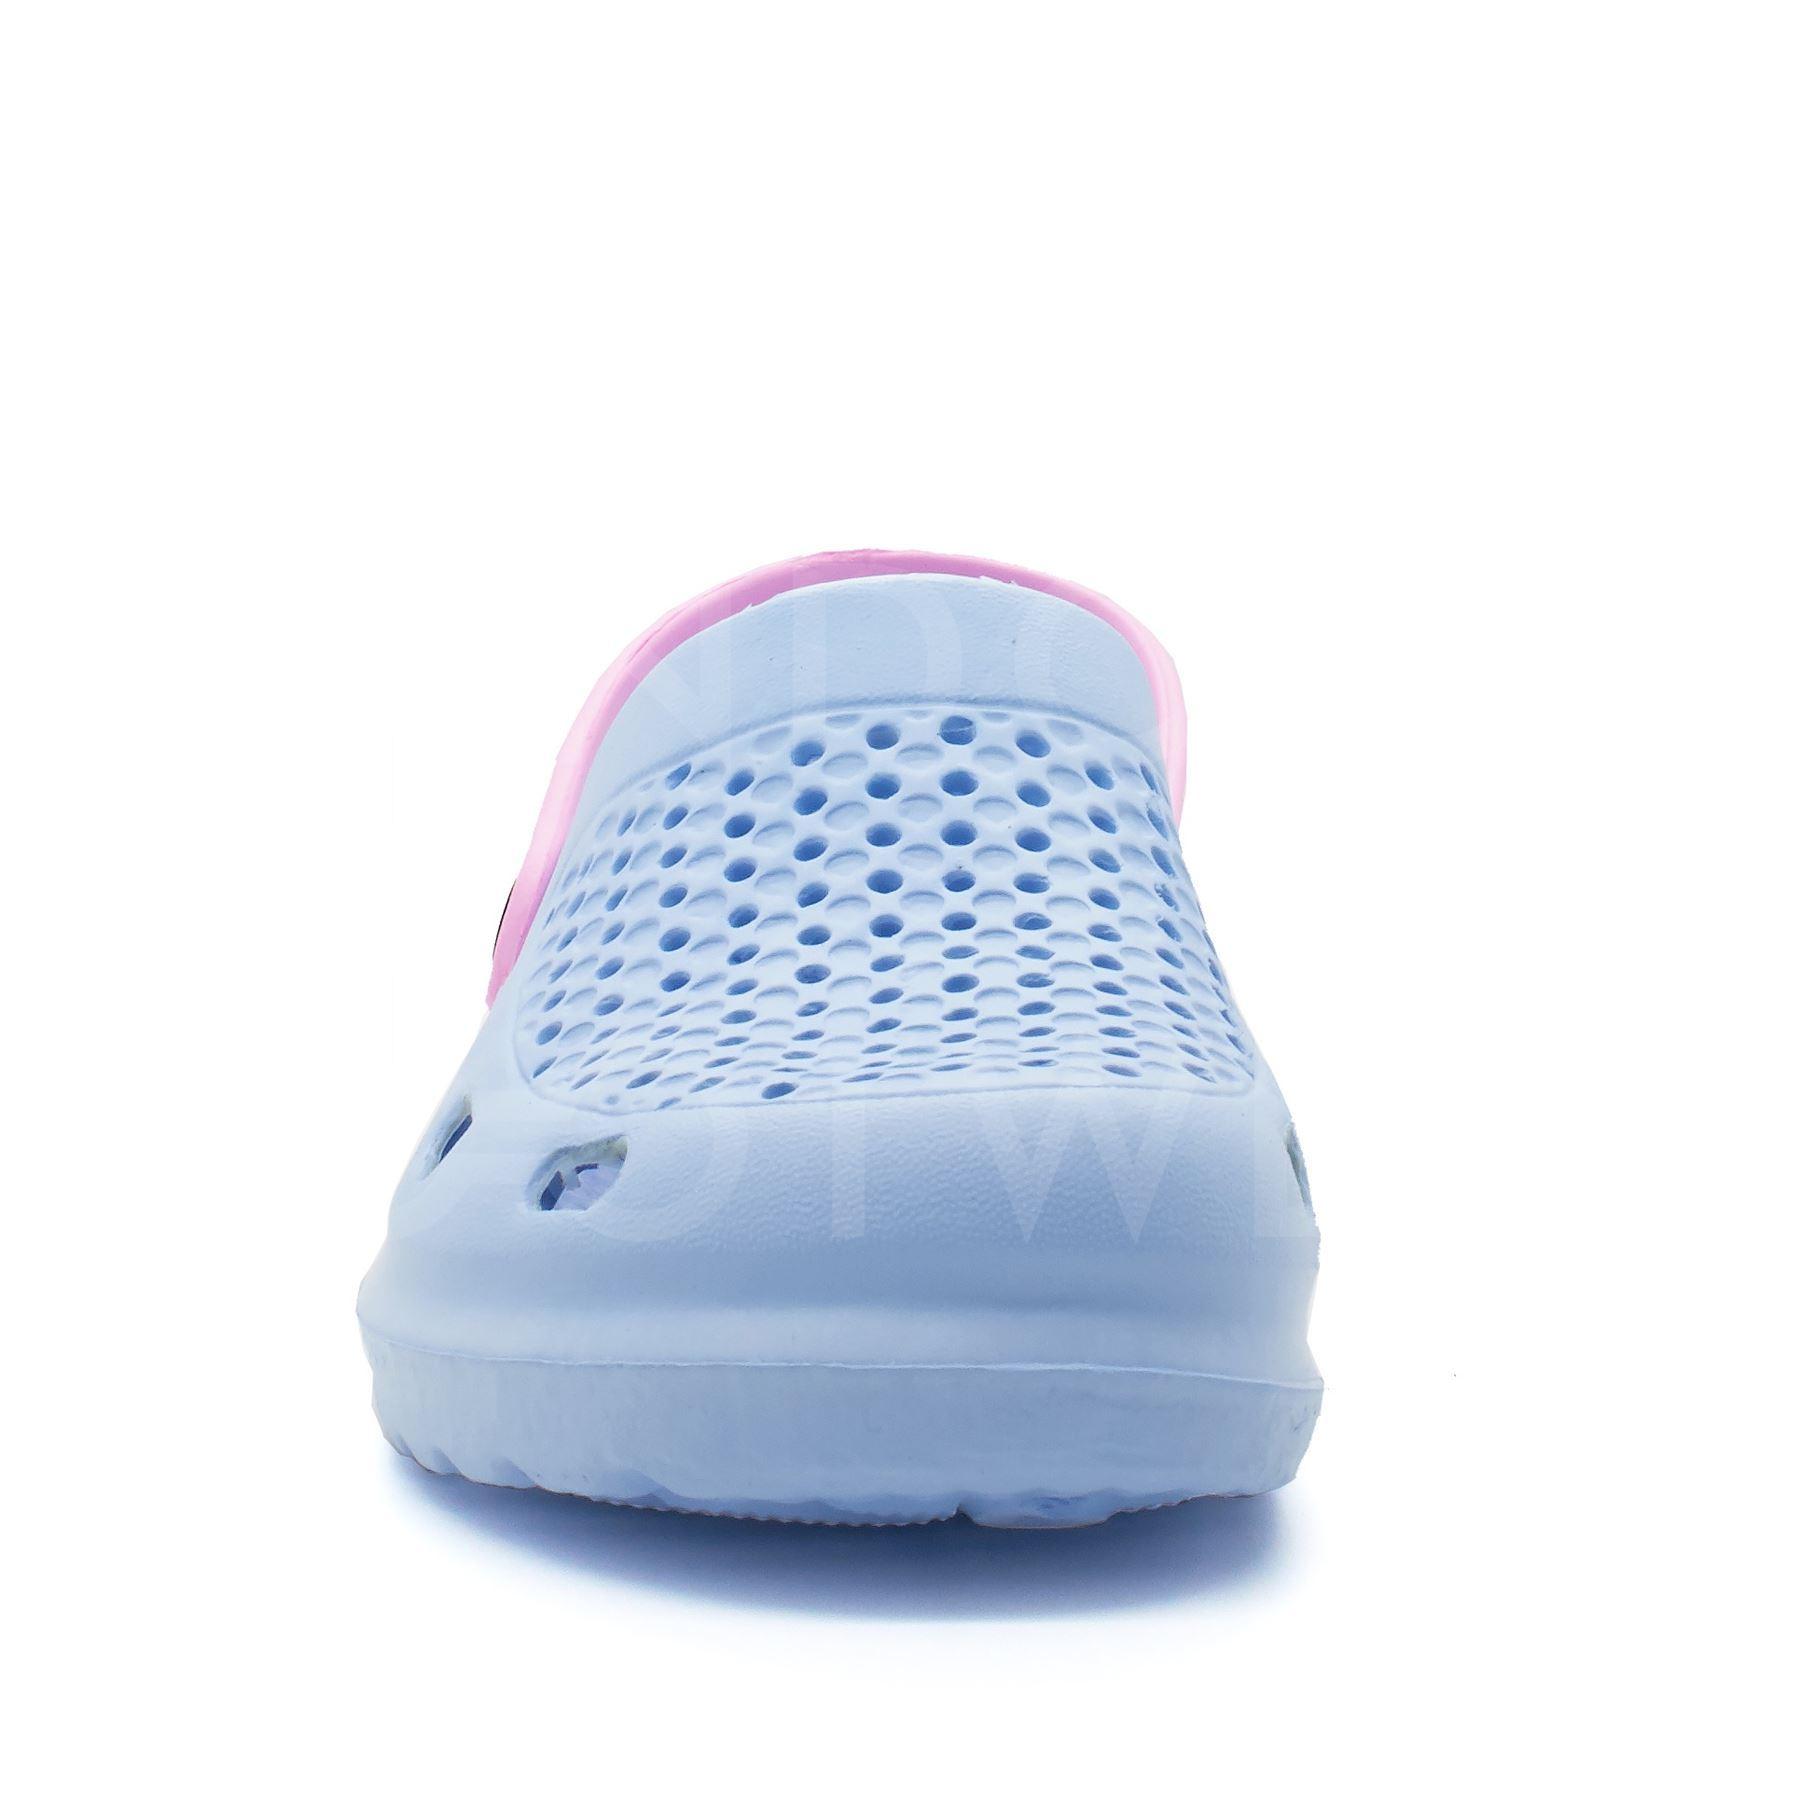 New Womens Clogs Garden Kitchen Hospital Sandals Shoes Ladies Beach ...